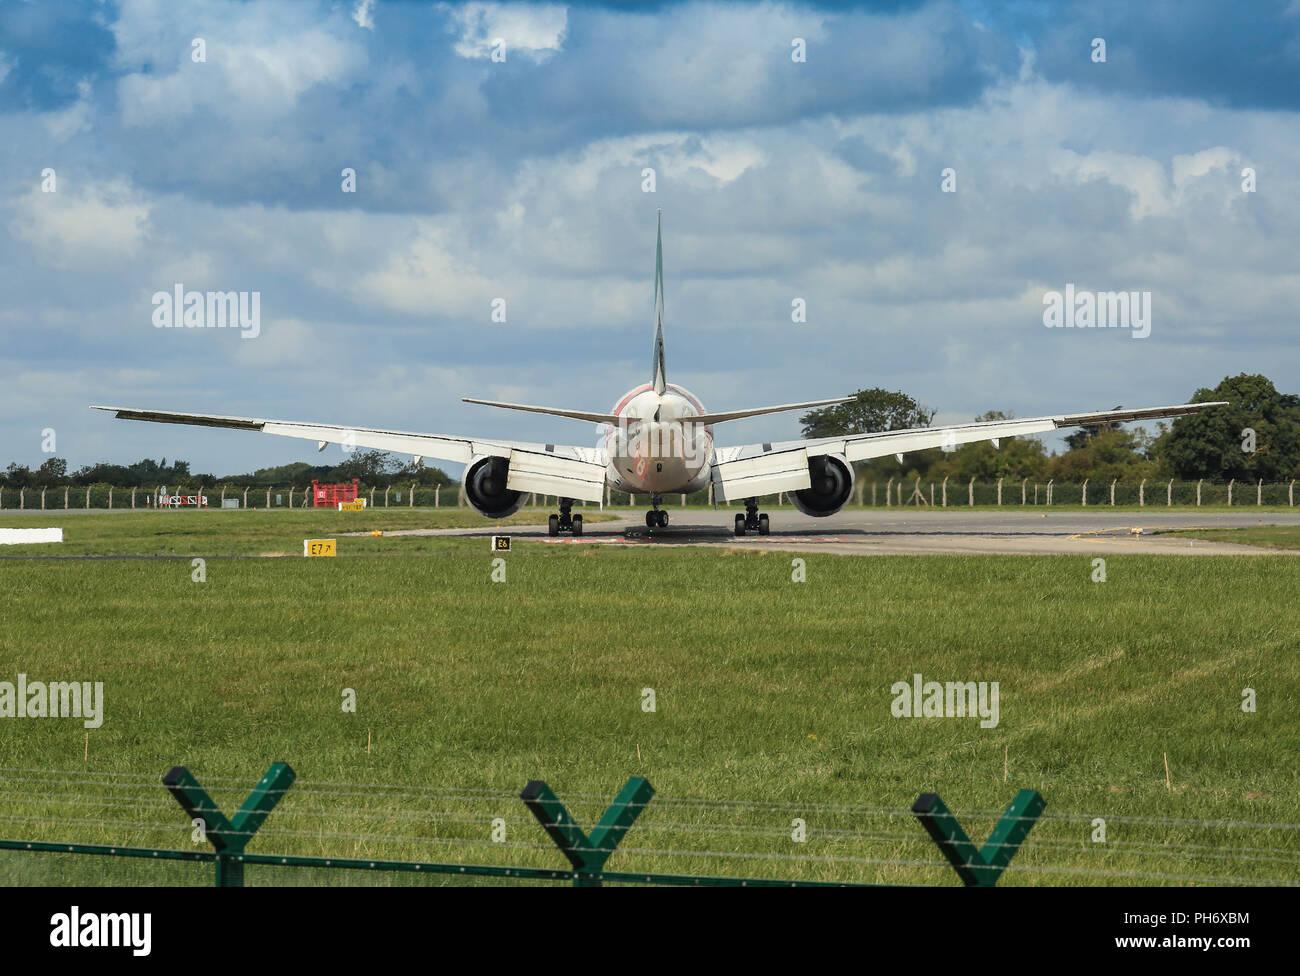 Dublin Airport landings and departures. - Stock Image